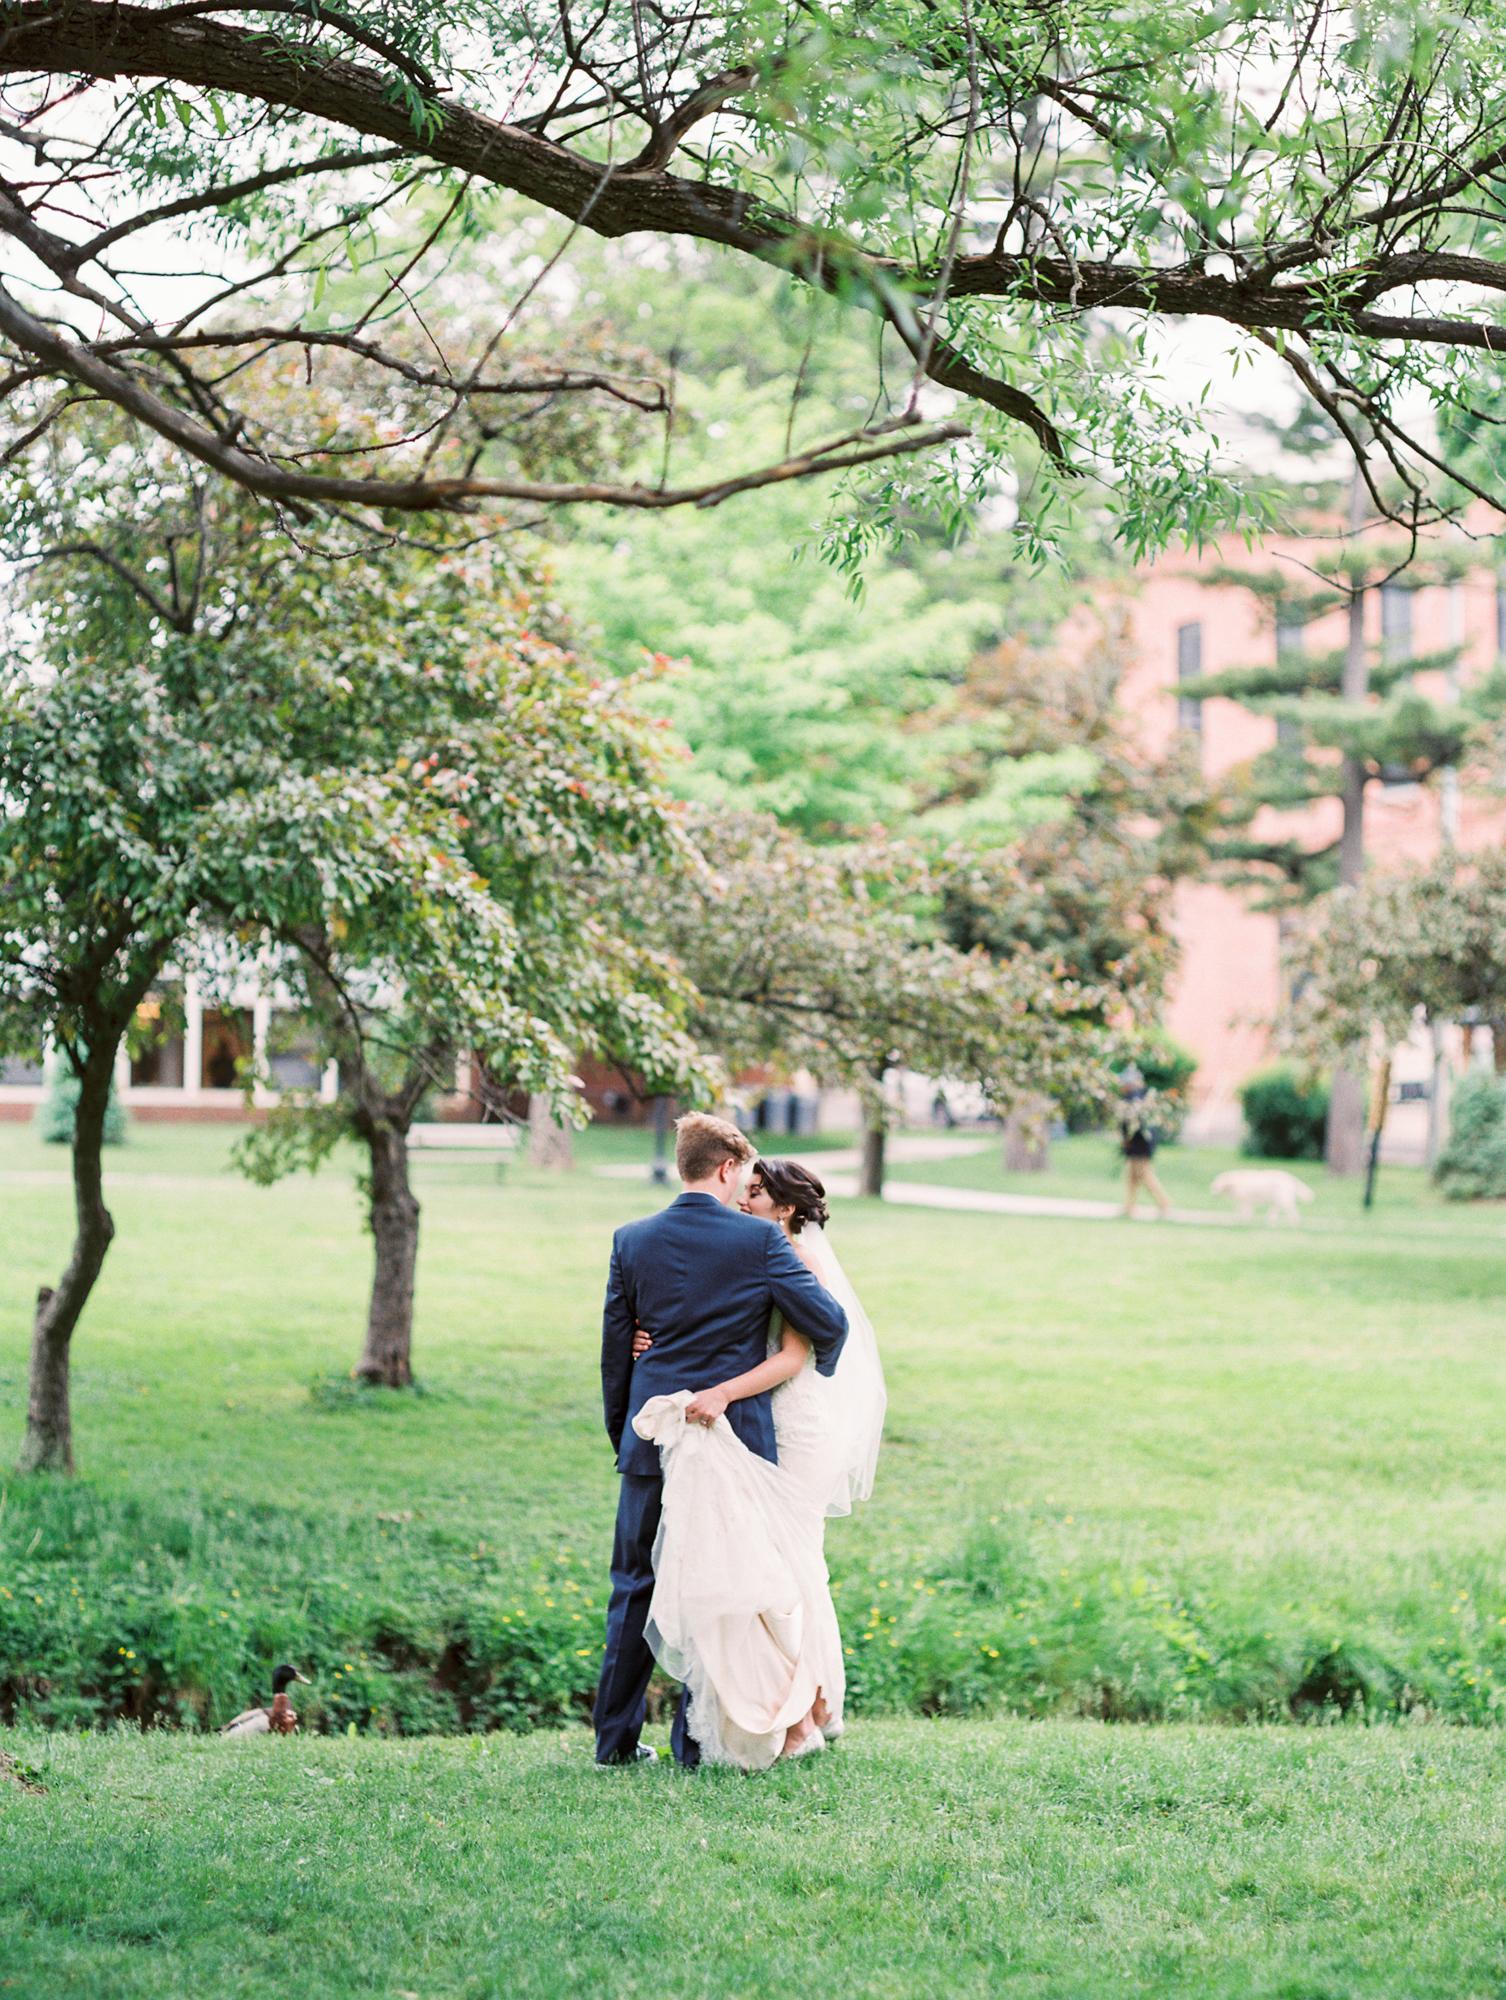 saratoga-springs-new-york-national-museum-of-dance-film-wedding-photographer-11.jpg